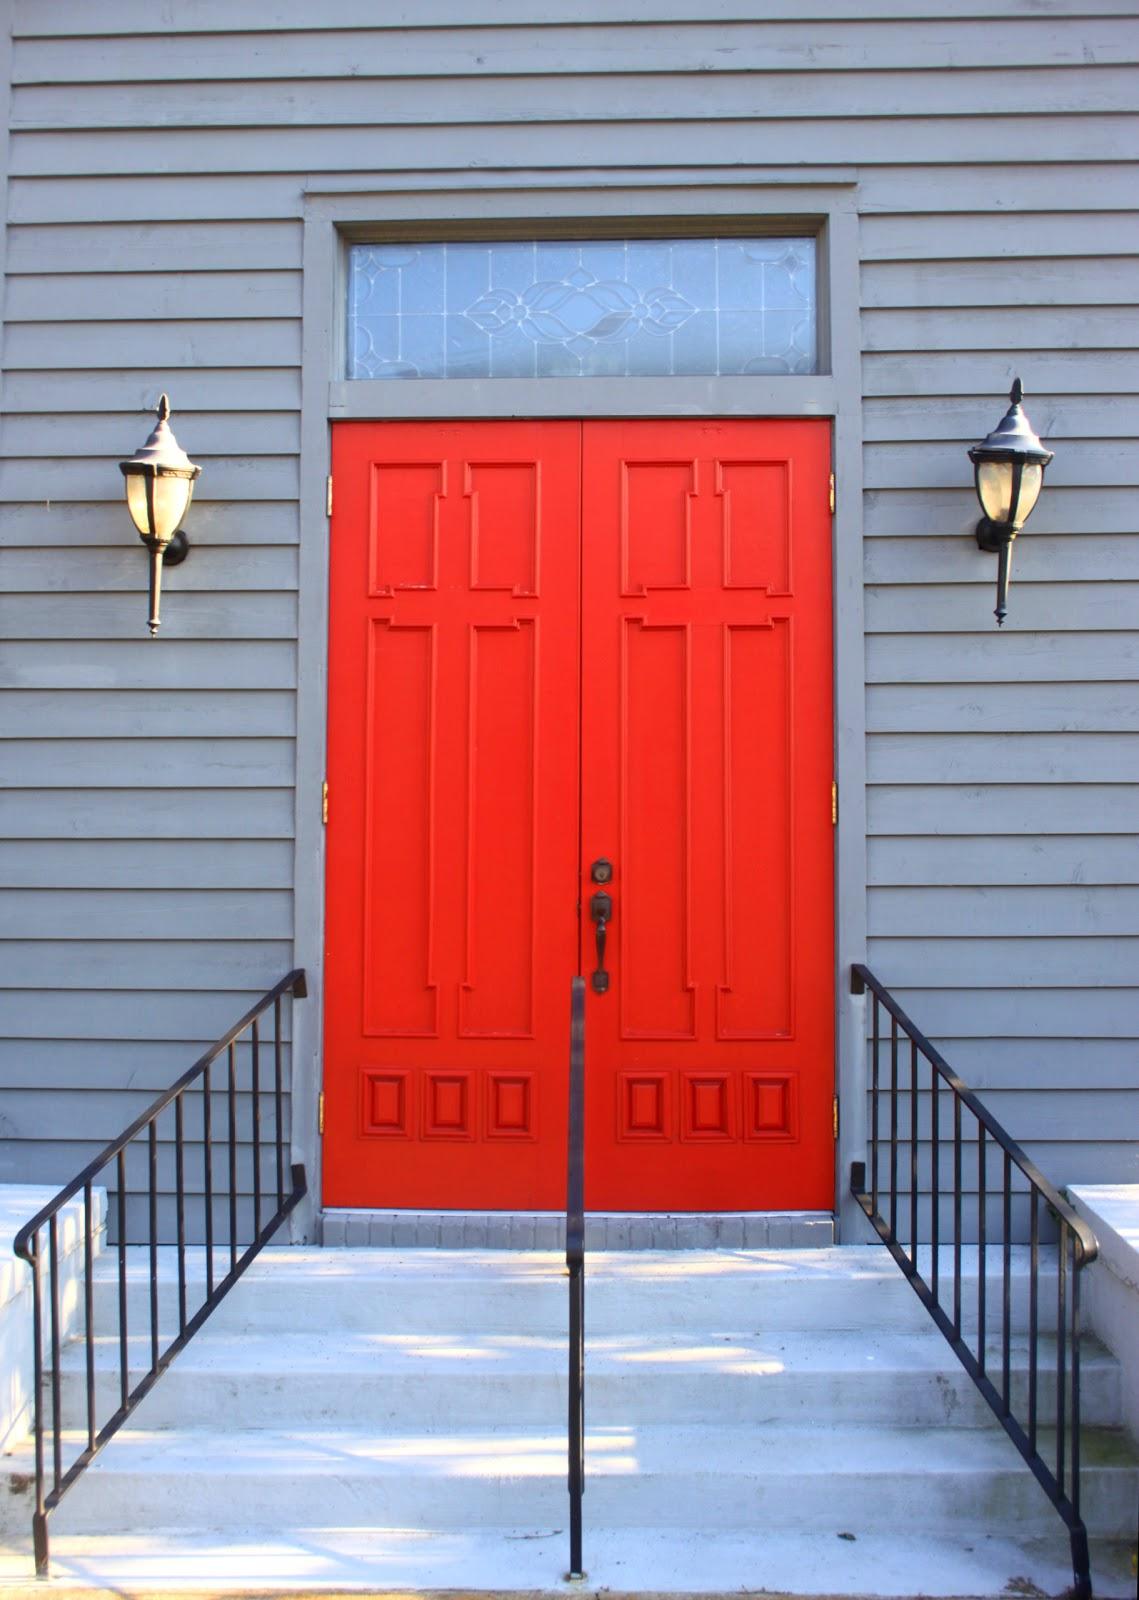 Behind The Red Doors